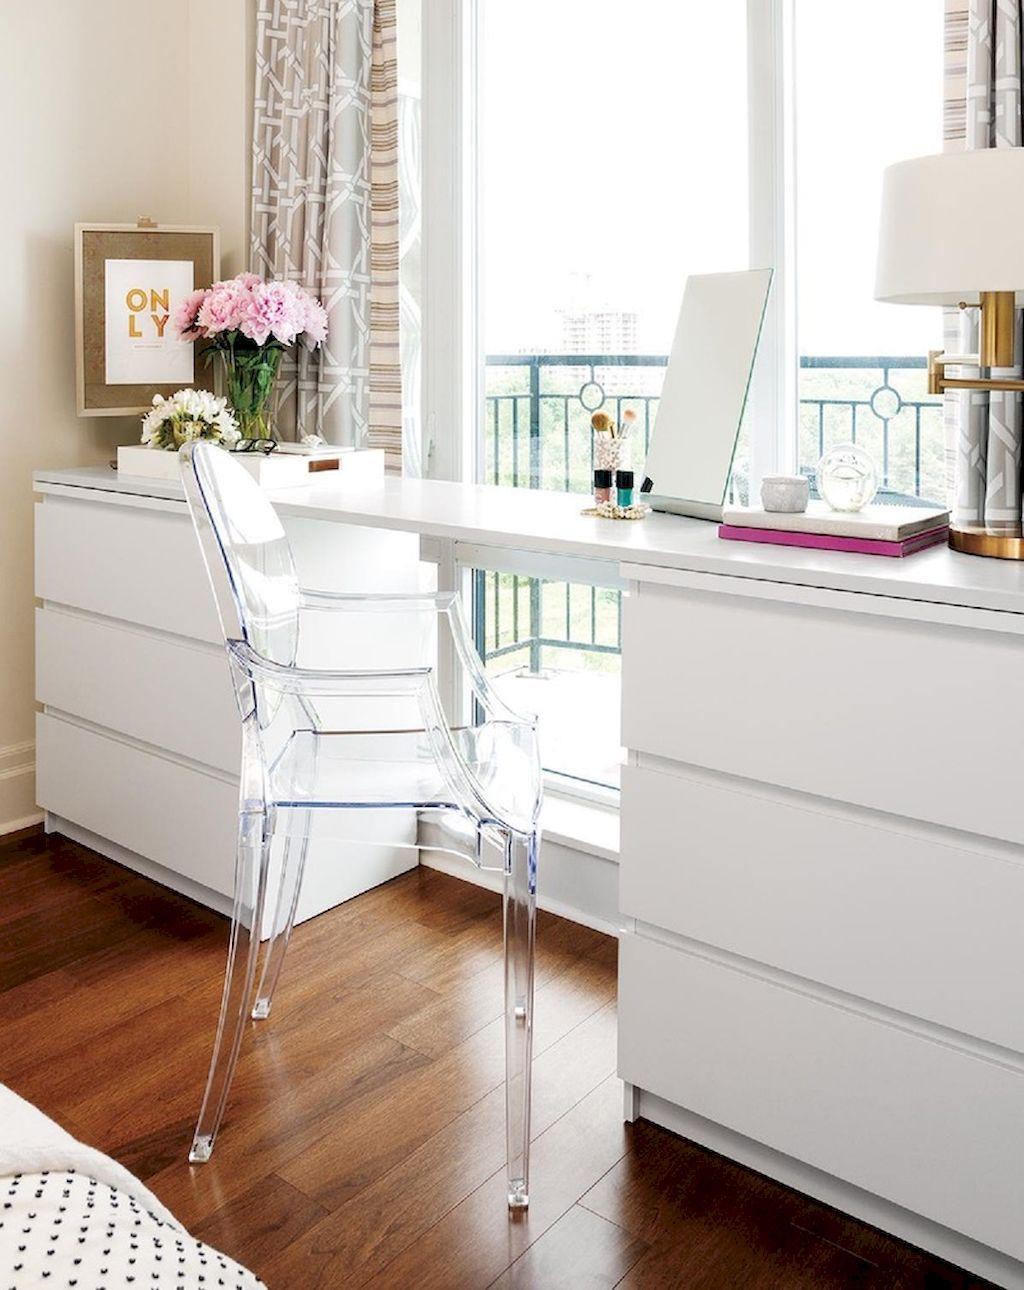 Good Cool 66+ Amazing IKEA Hacks To Decorate Bedroom On A Budget #Amazing # Bedroom